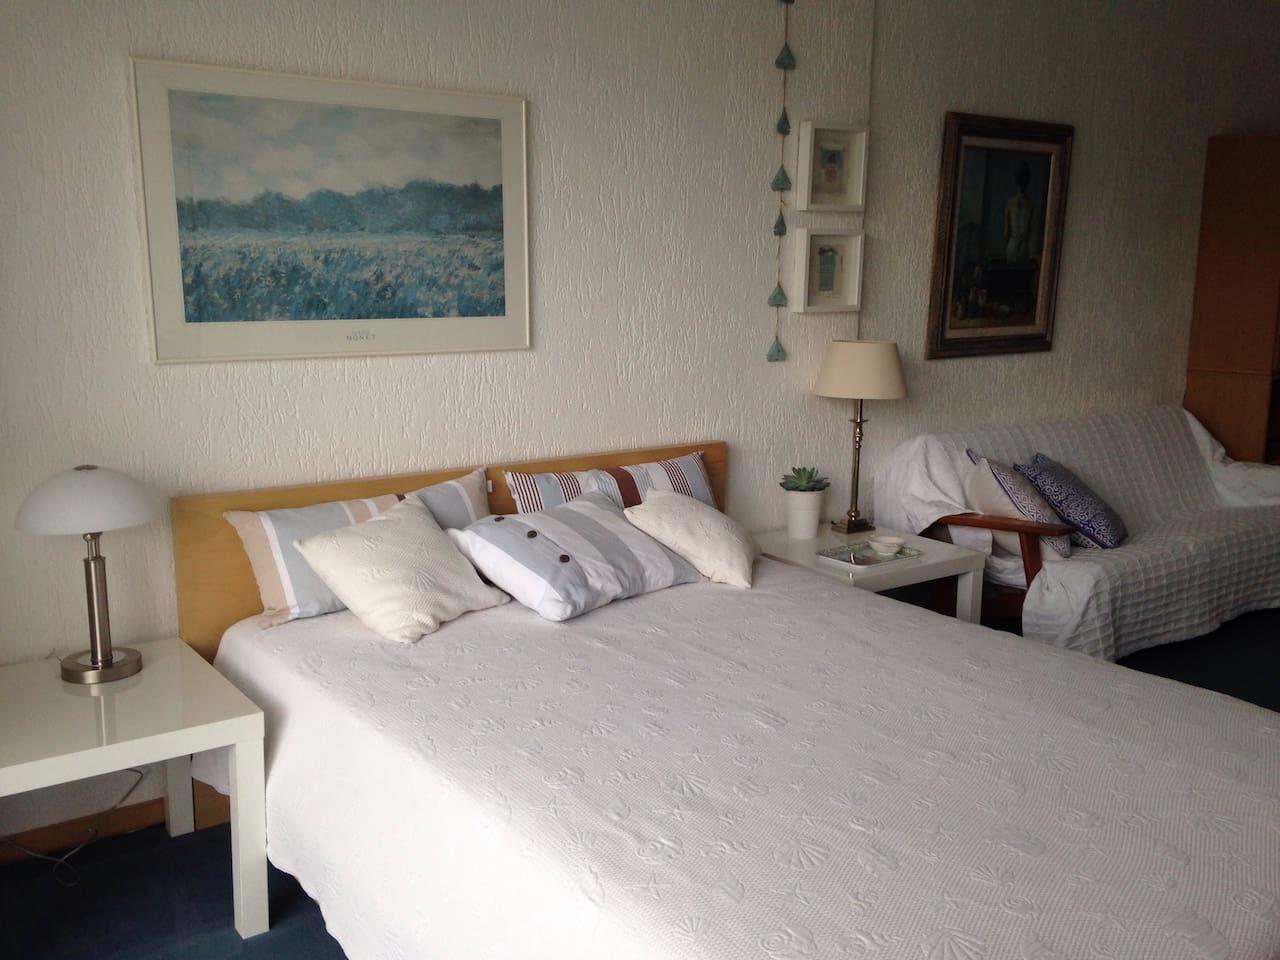 Doppelbett im Gästezimmer